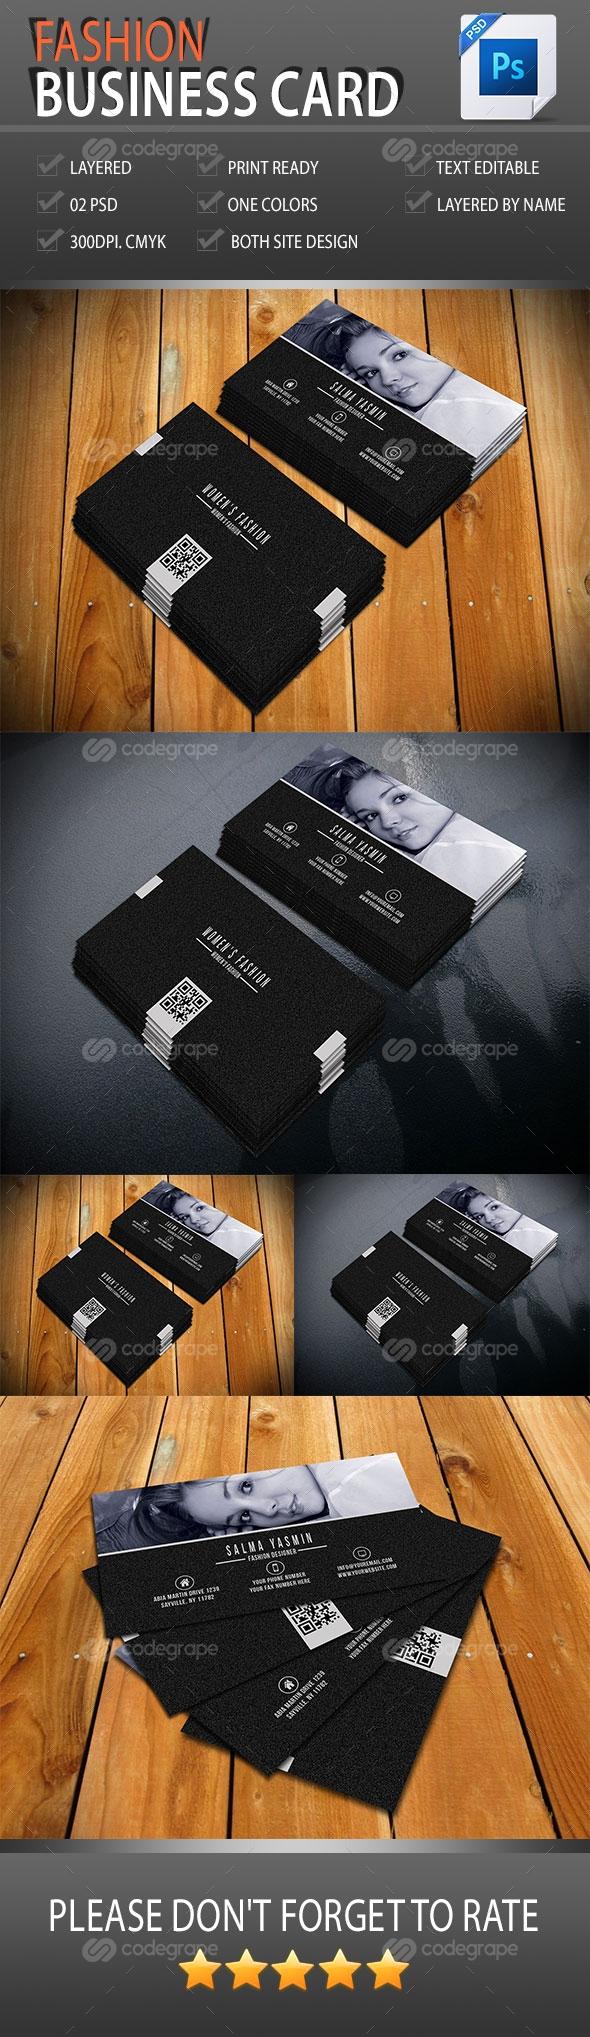 Fashion Business Card Vol-1.0